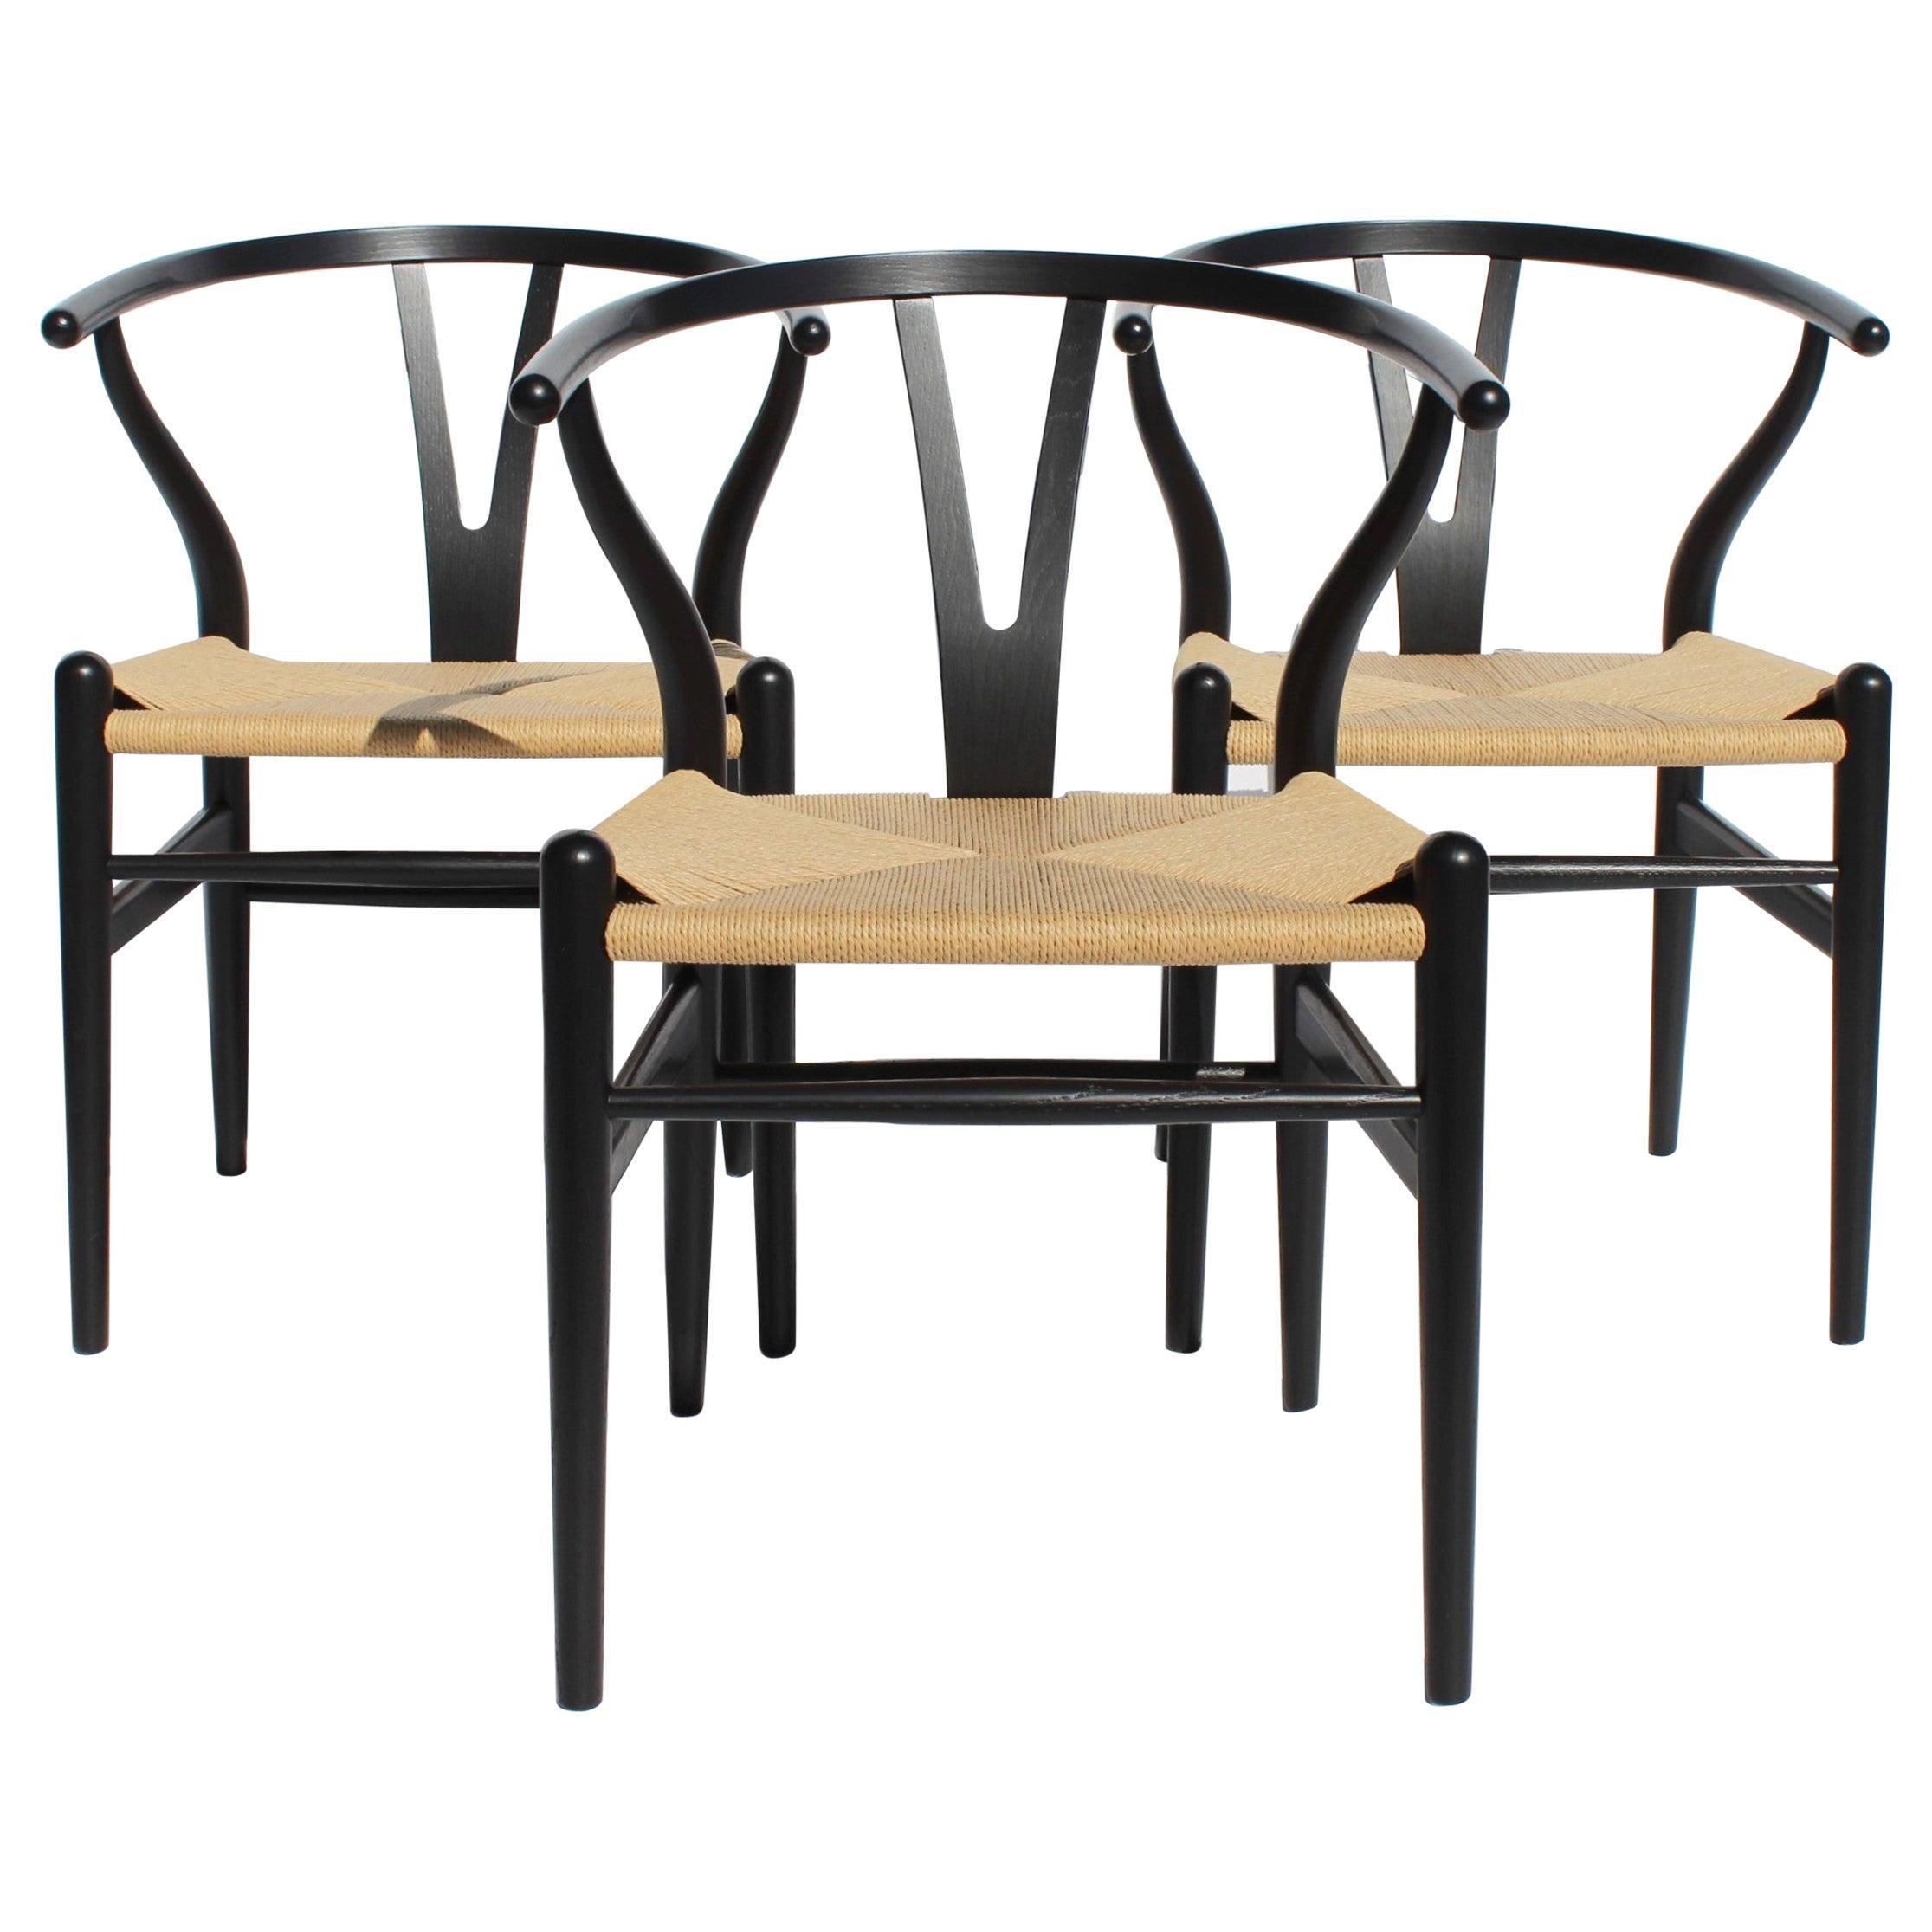 Set of Three Wishbone Chairs, Model CH24, by Hans J. Wegner